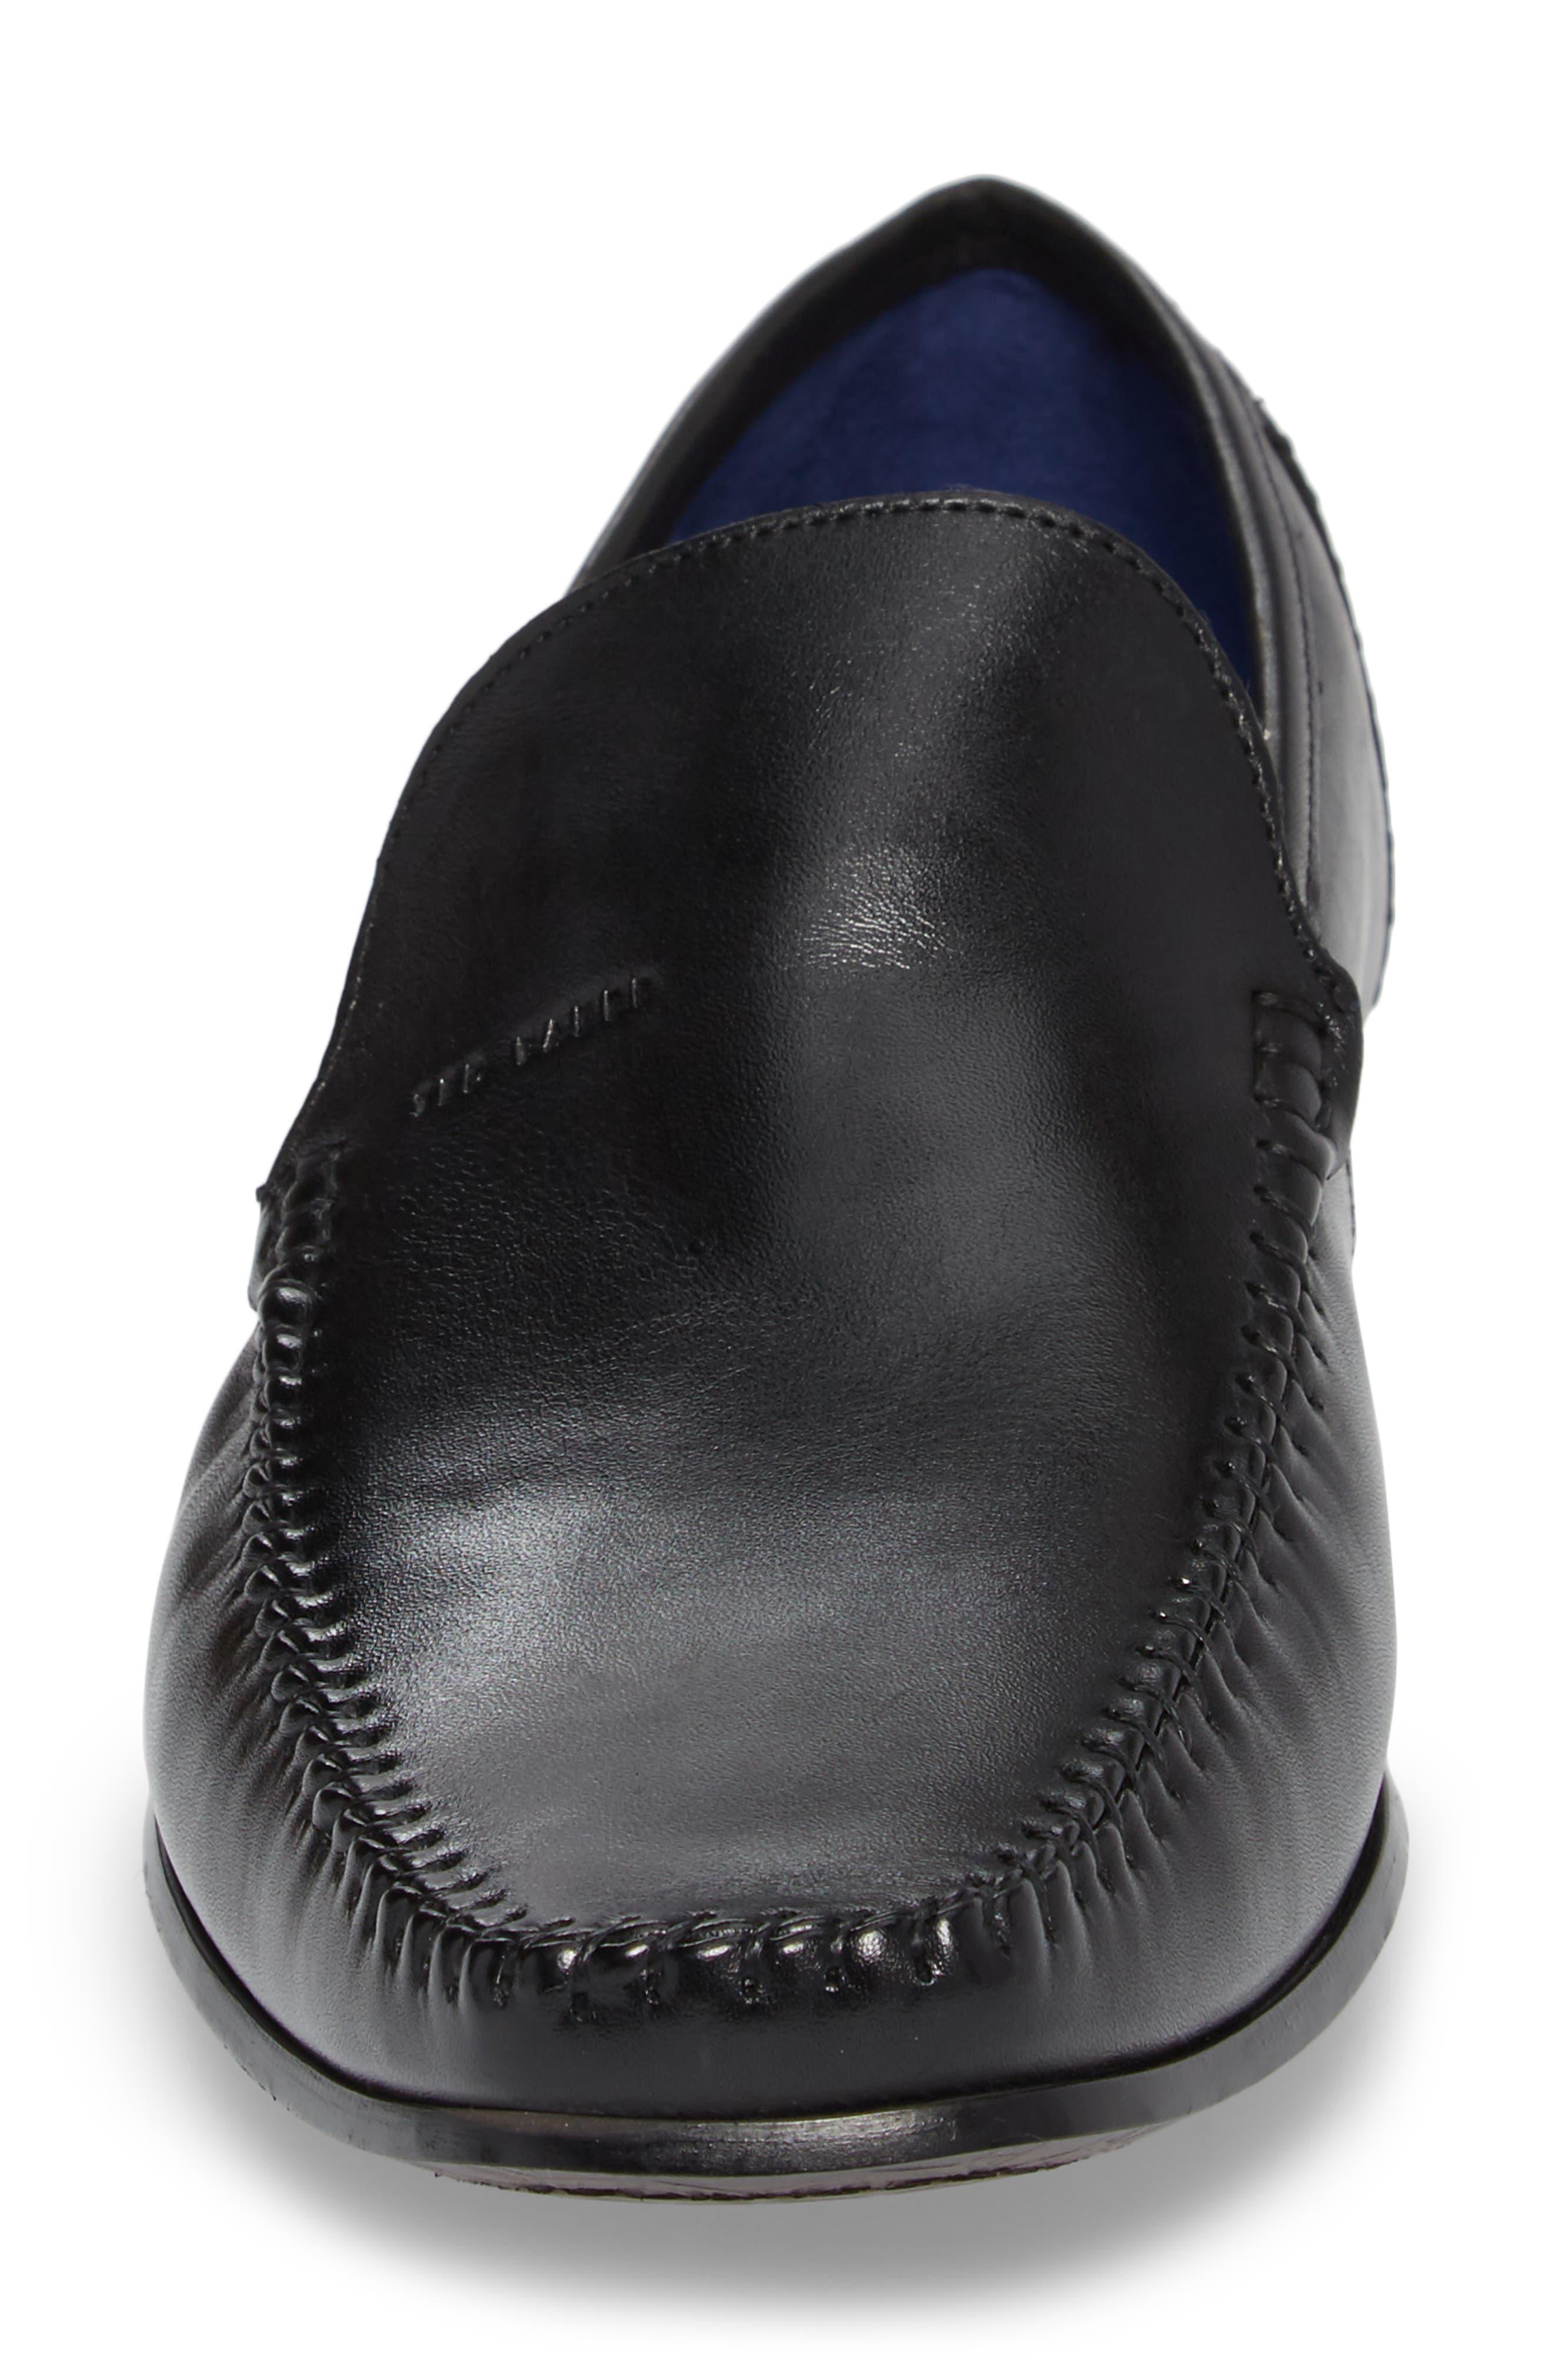 Bly 9 Venetian Loafer,                             Alternate thumbnail 4, color,                             Black Leather